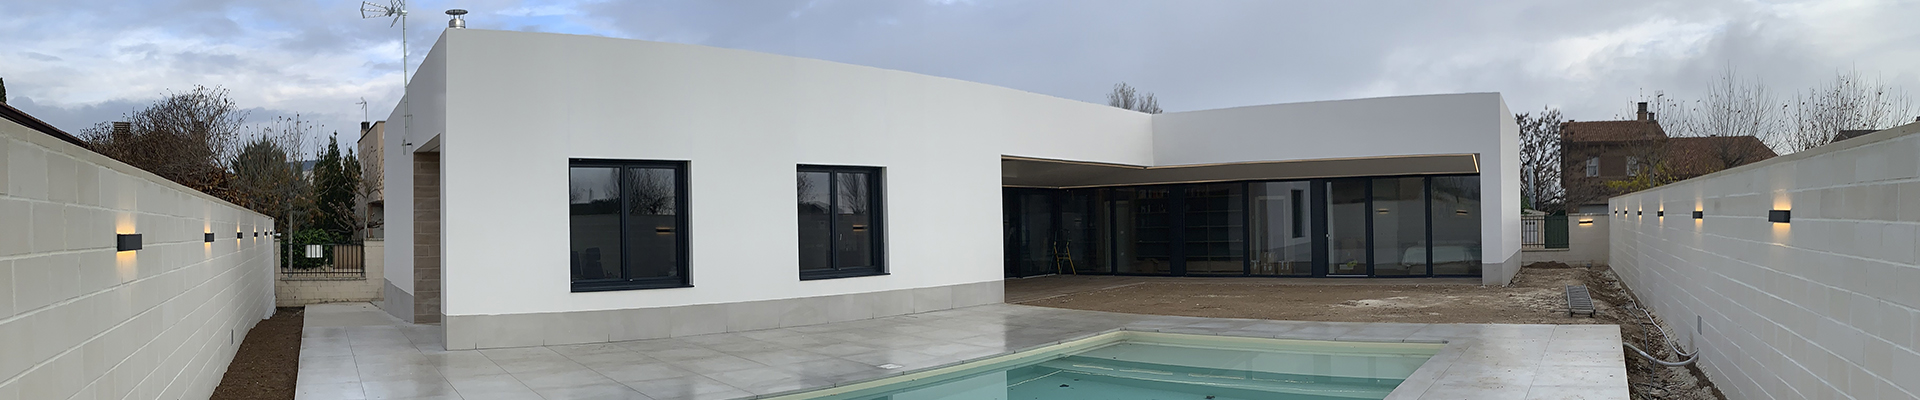 Beamonte y Vallejo Arquitectos - Passivhaus Utebo certificada